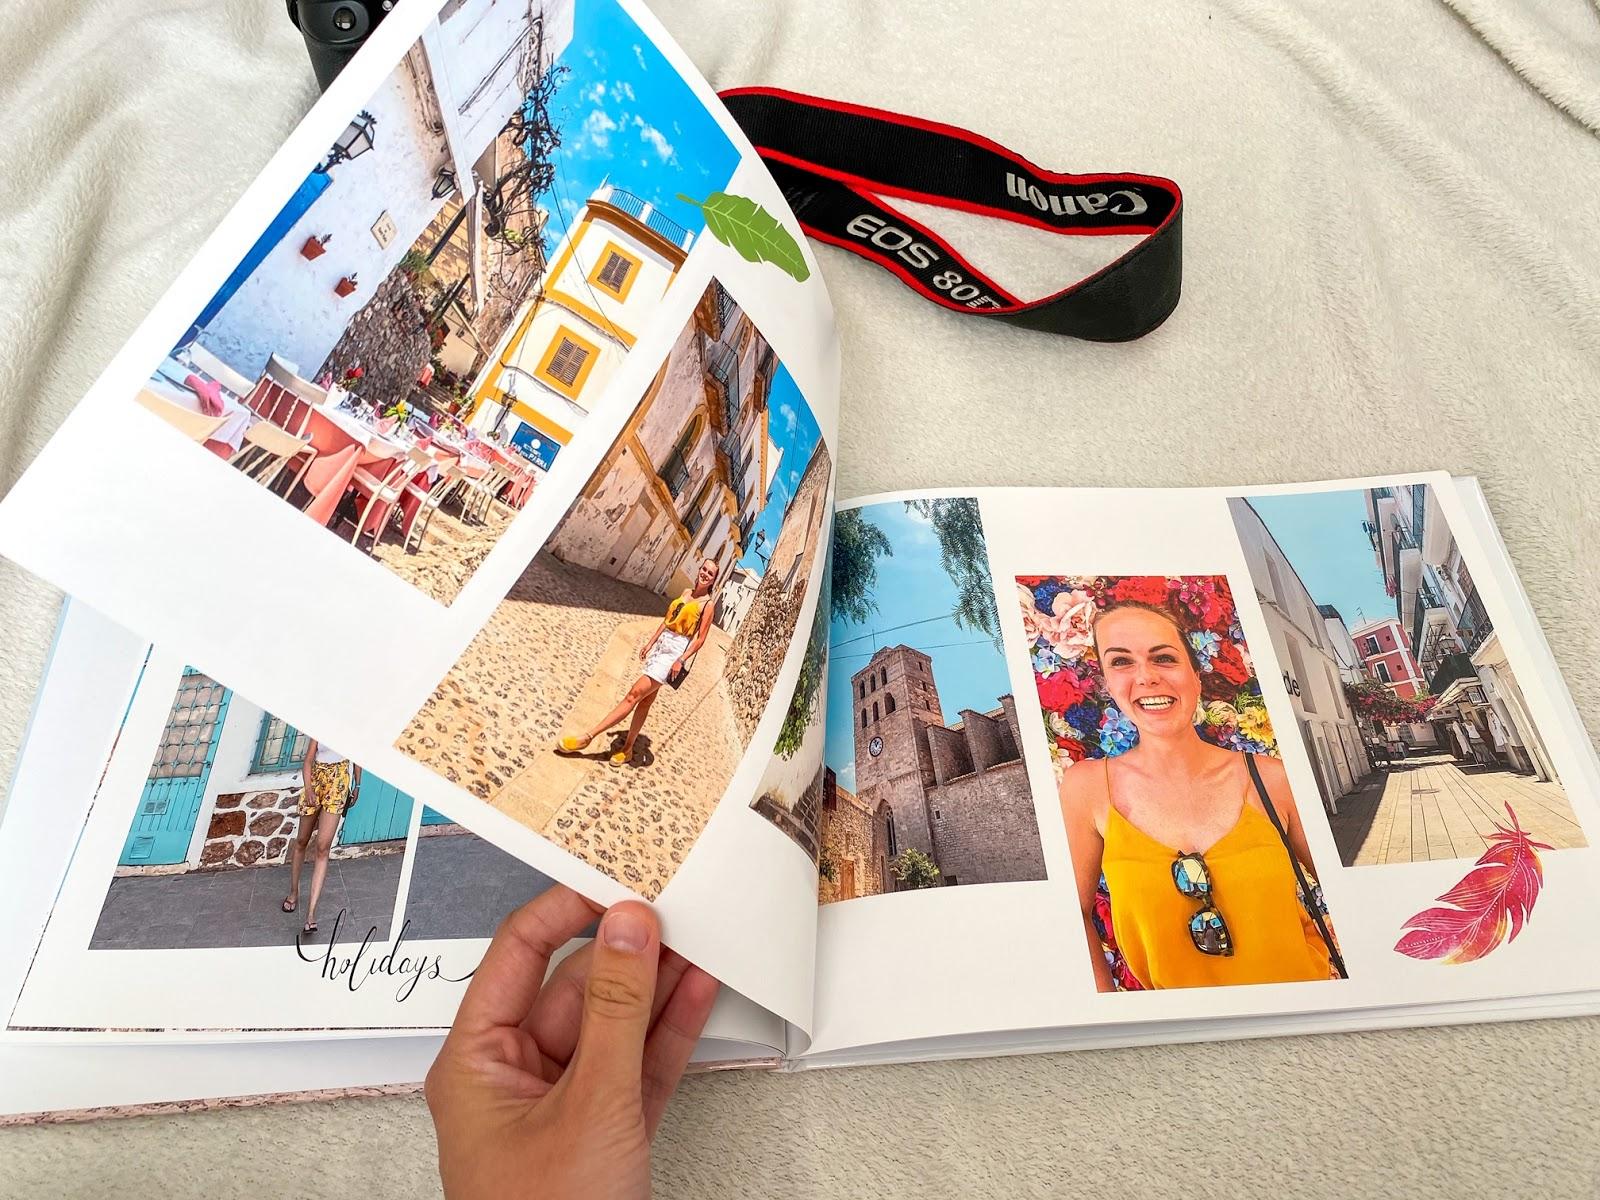 Review Fotoboek van Fotofabriek.nl